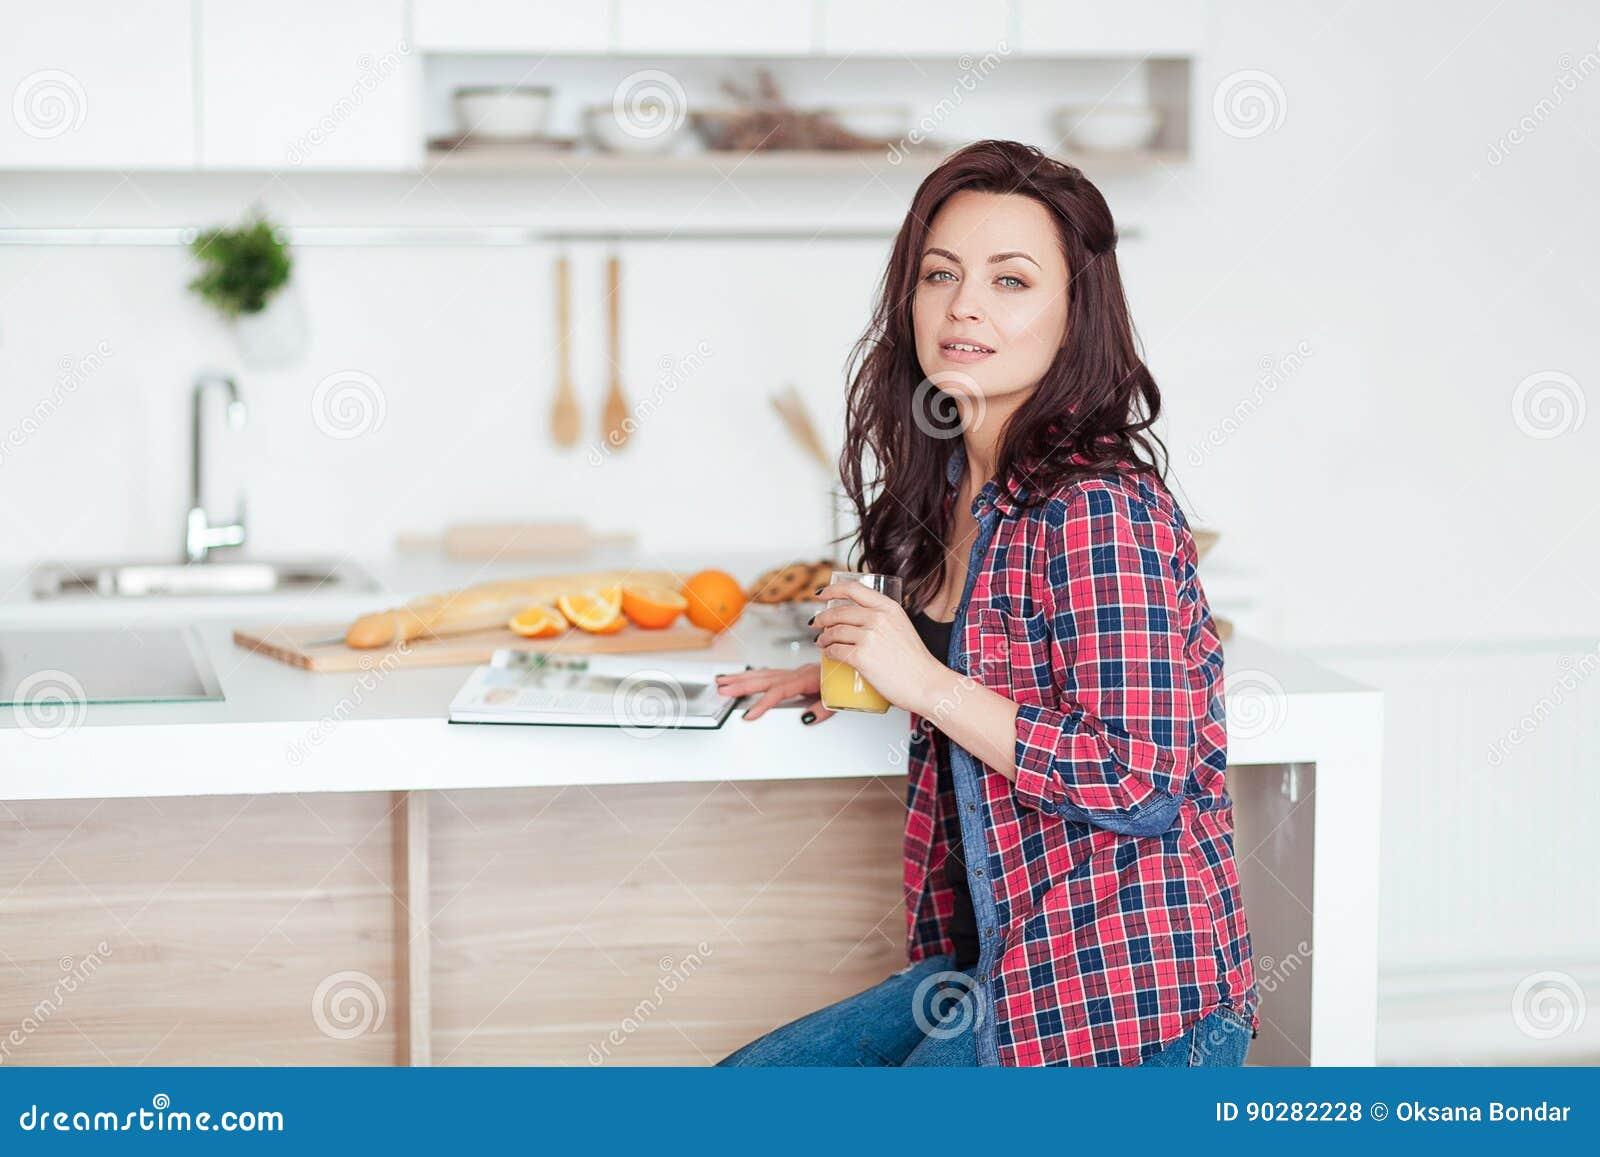 breakfast - smiling woman reading book in white kitchen, fresh